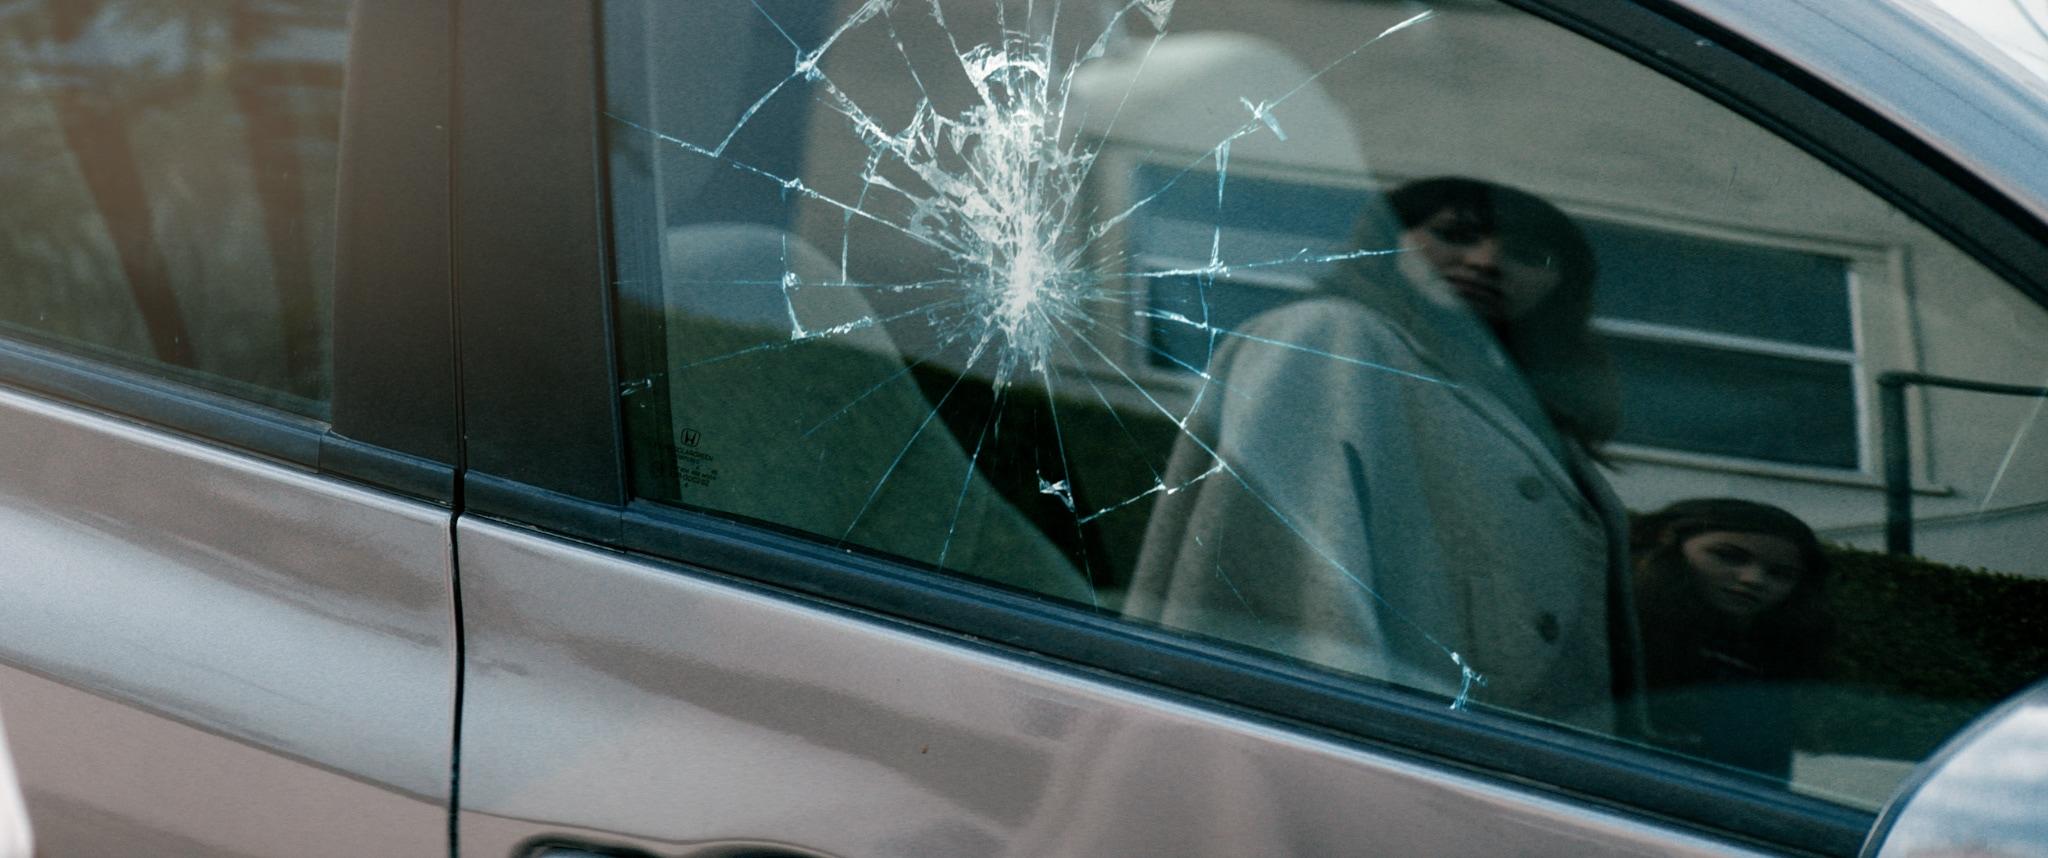 cracked_car_window